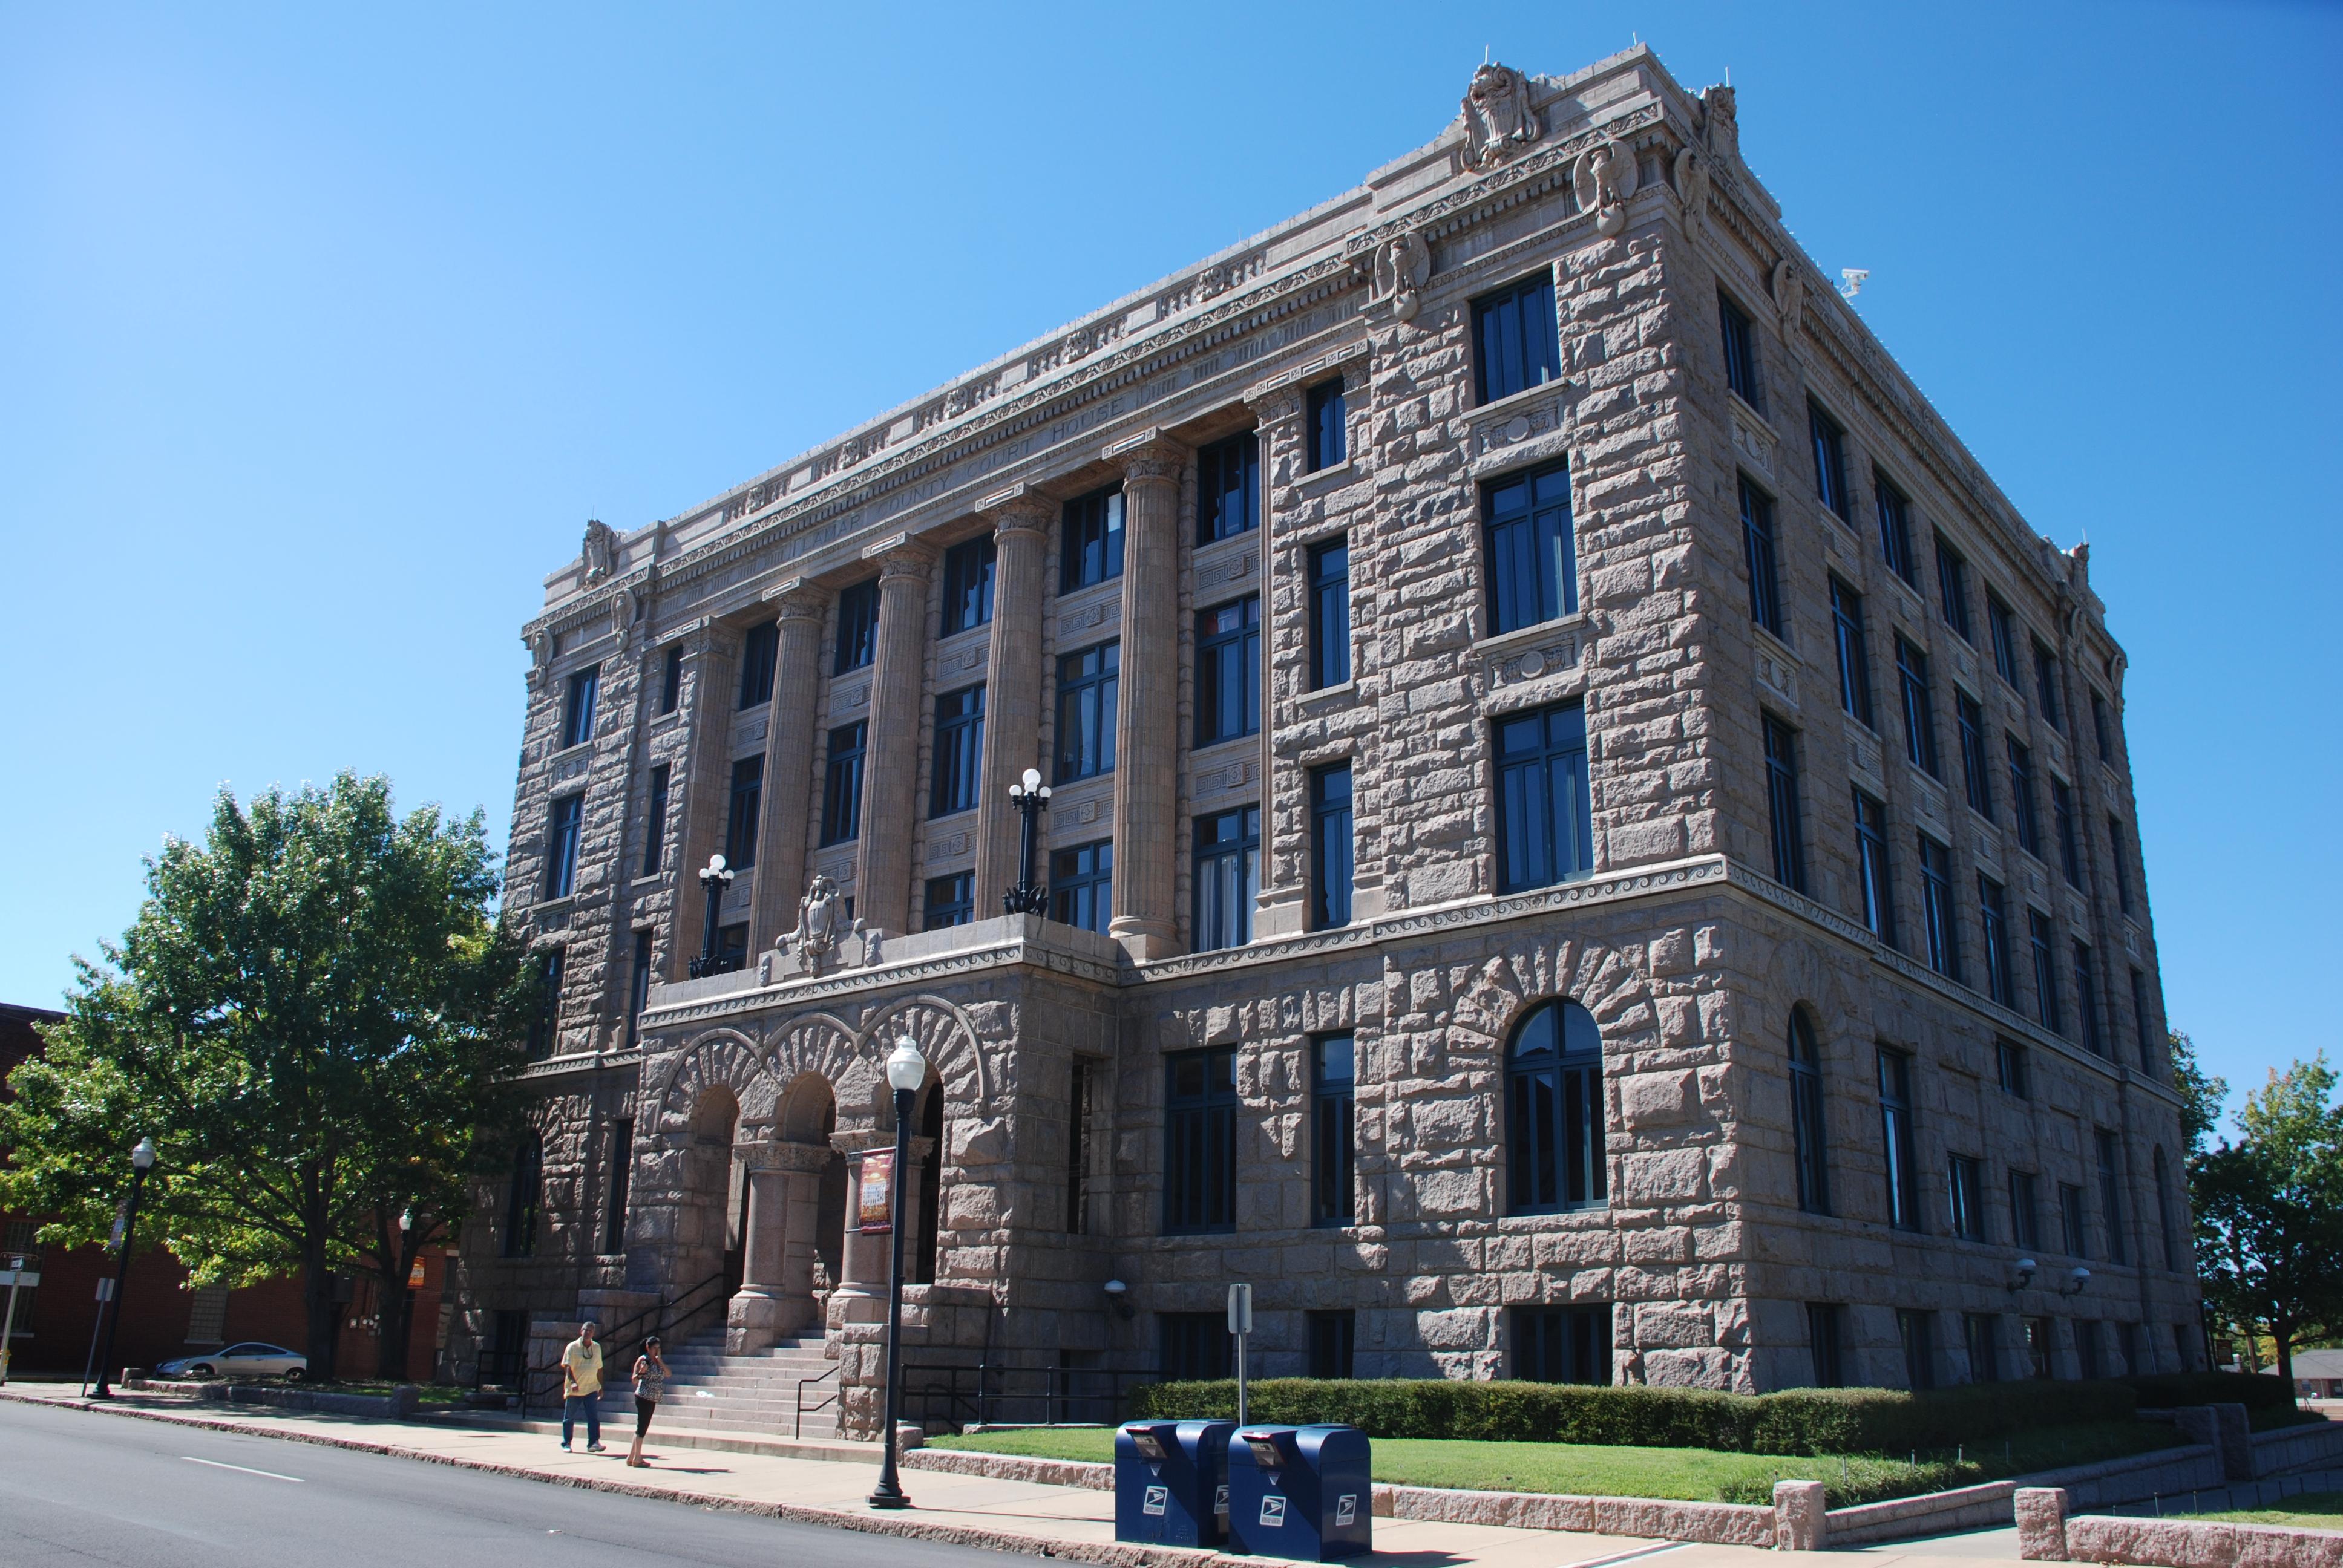 File:Lamar County Courthouse Paris Texas DSC 0641 ad.JPGbalance of lamar county